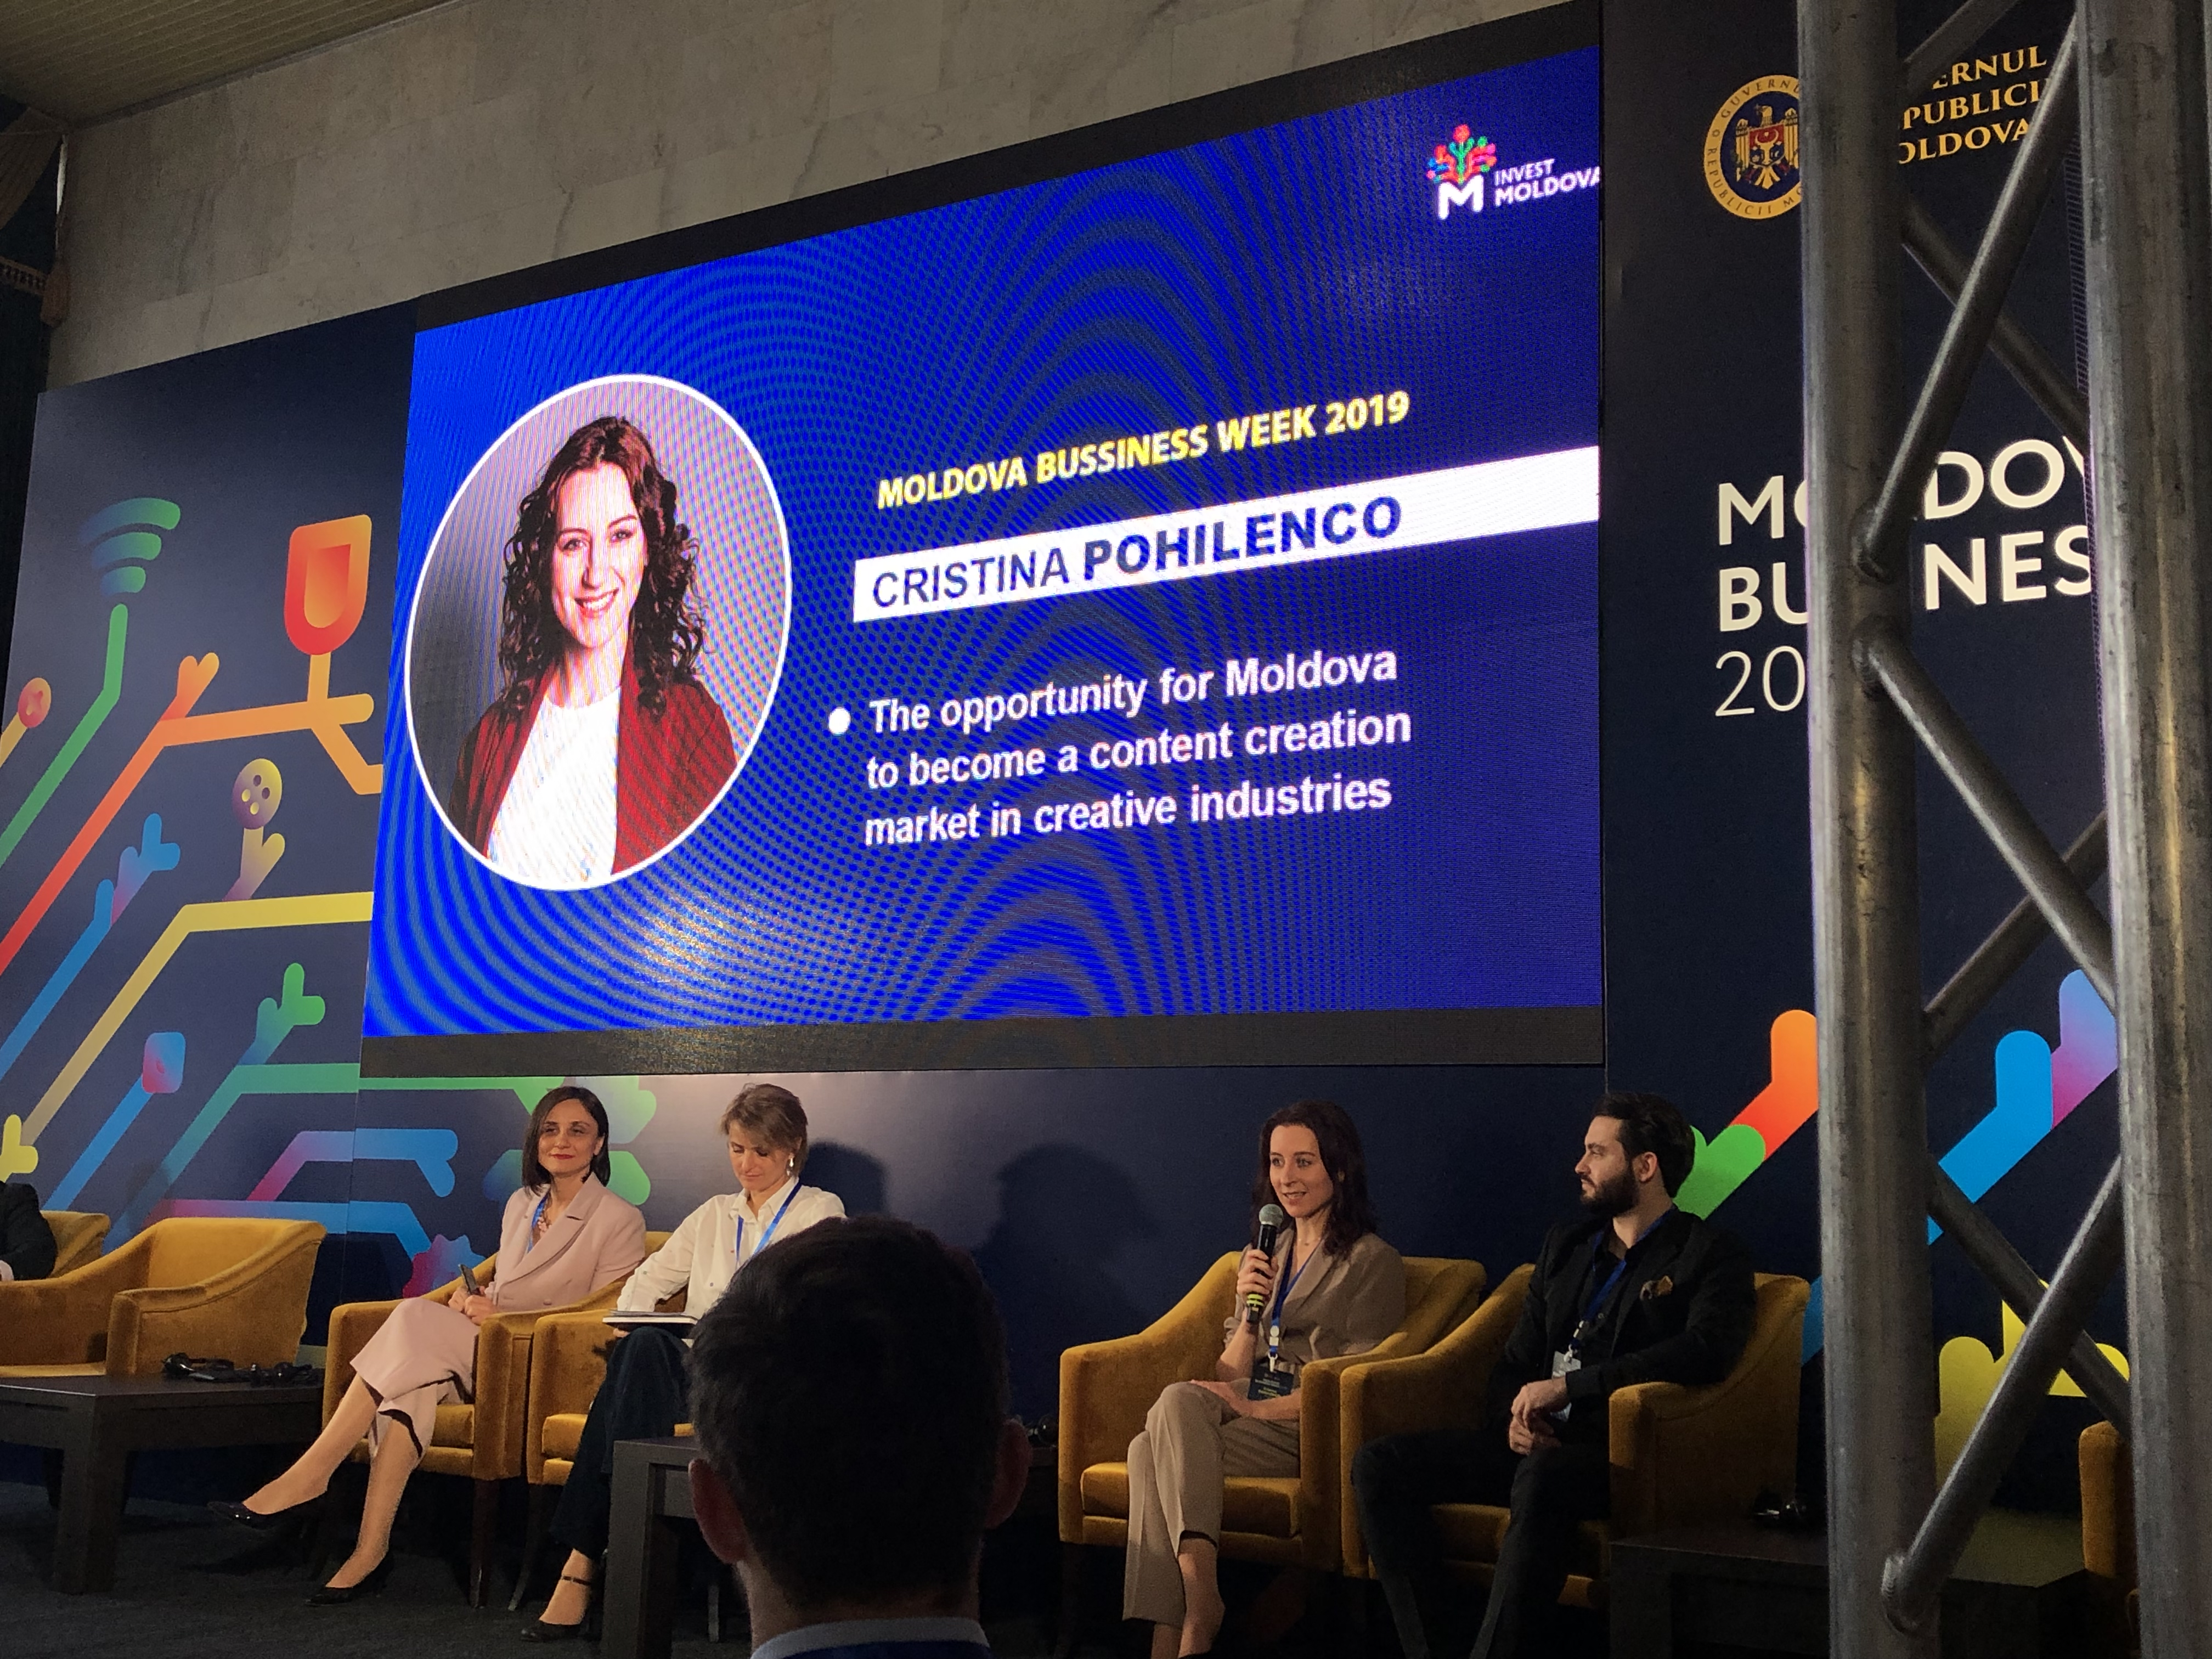 Moldova Business Week